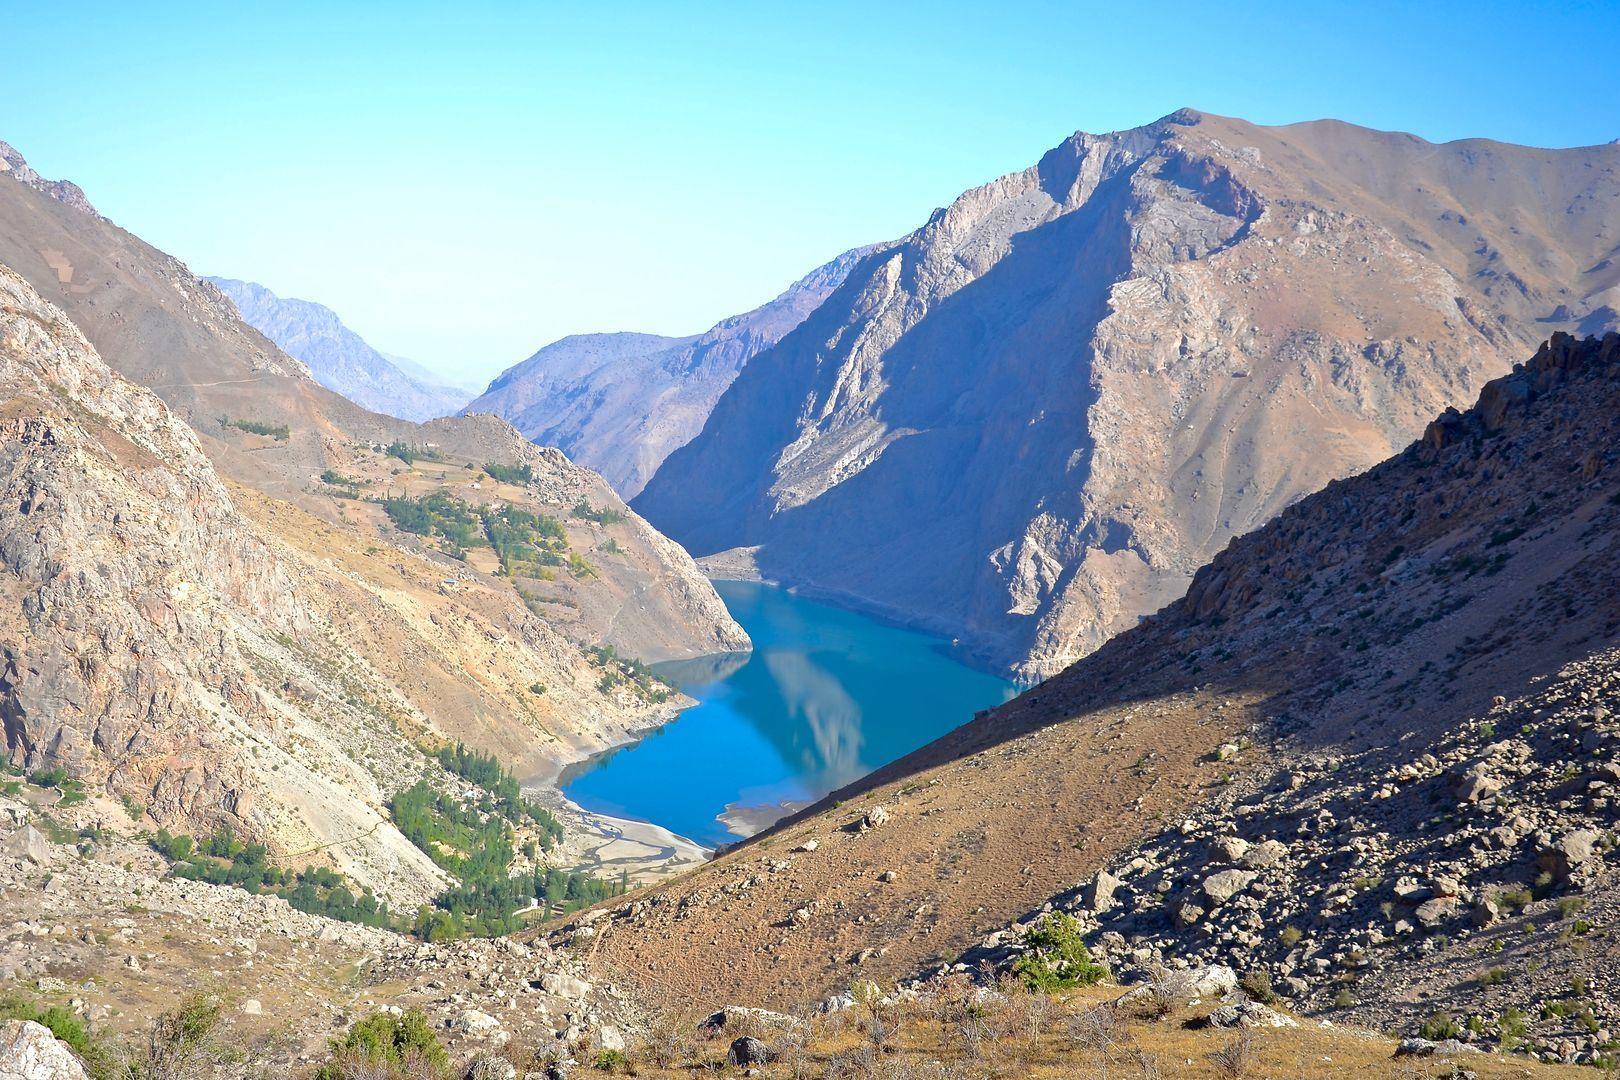 mountains seen as if in physical map-Fann mountains Tour in Tajikistan